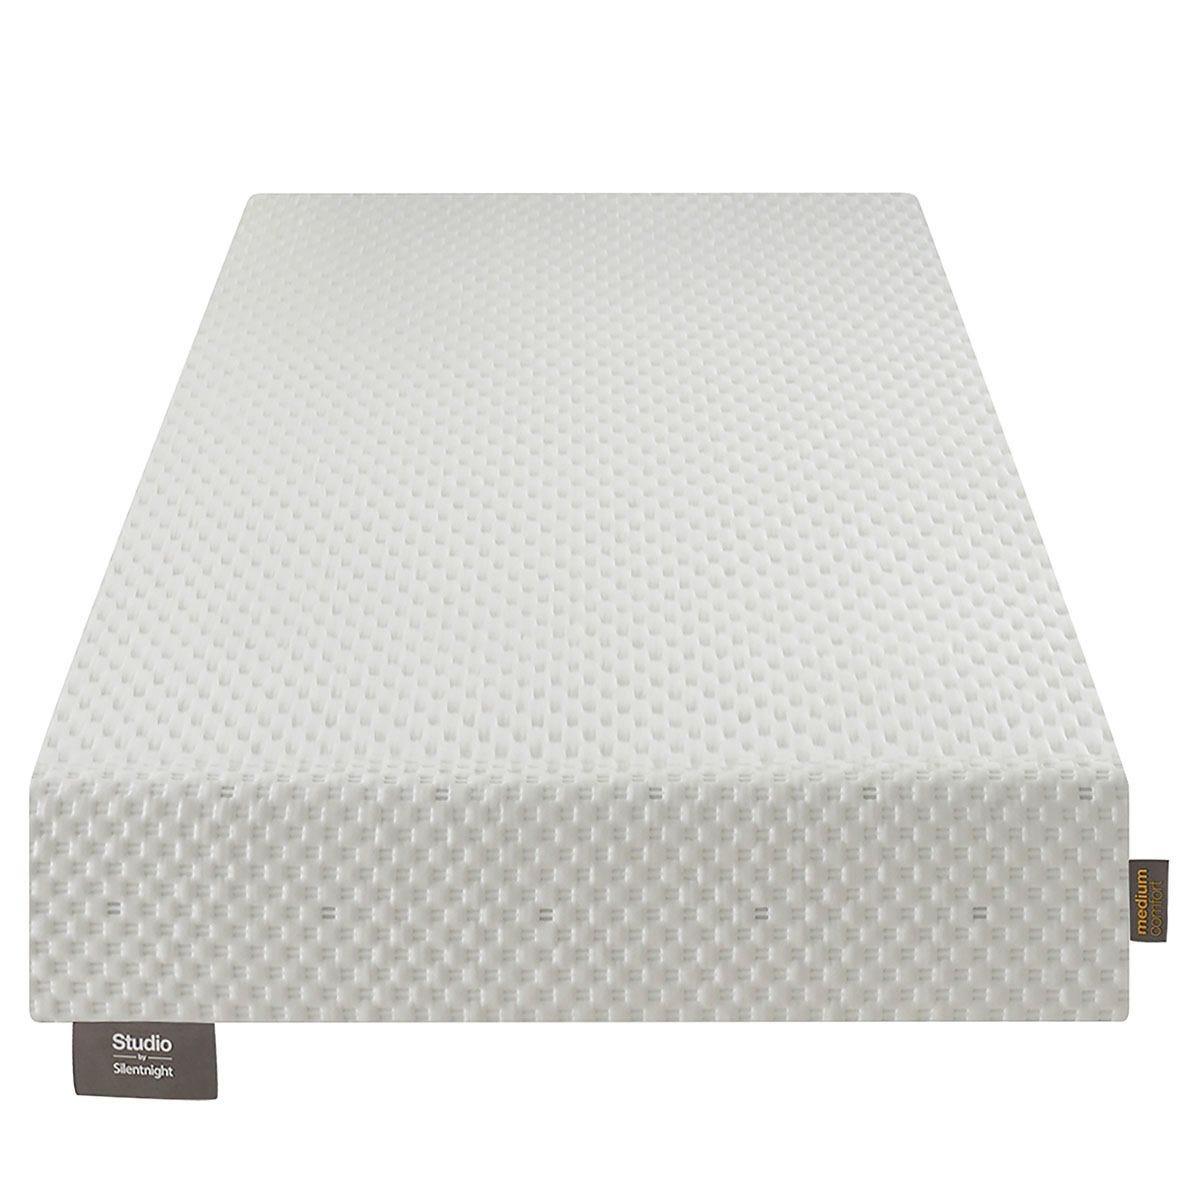 Silentnight Studio Medium White Mattress - Single